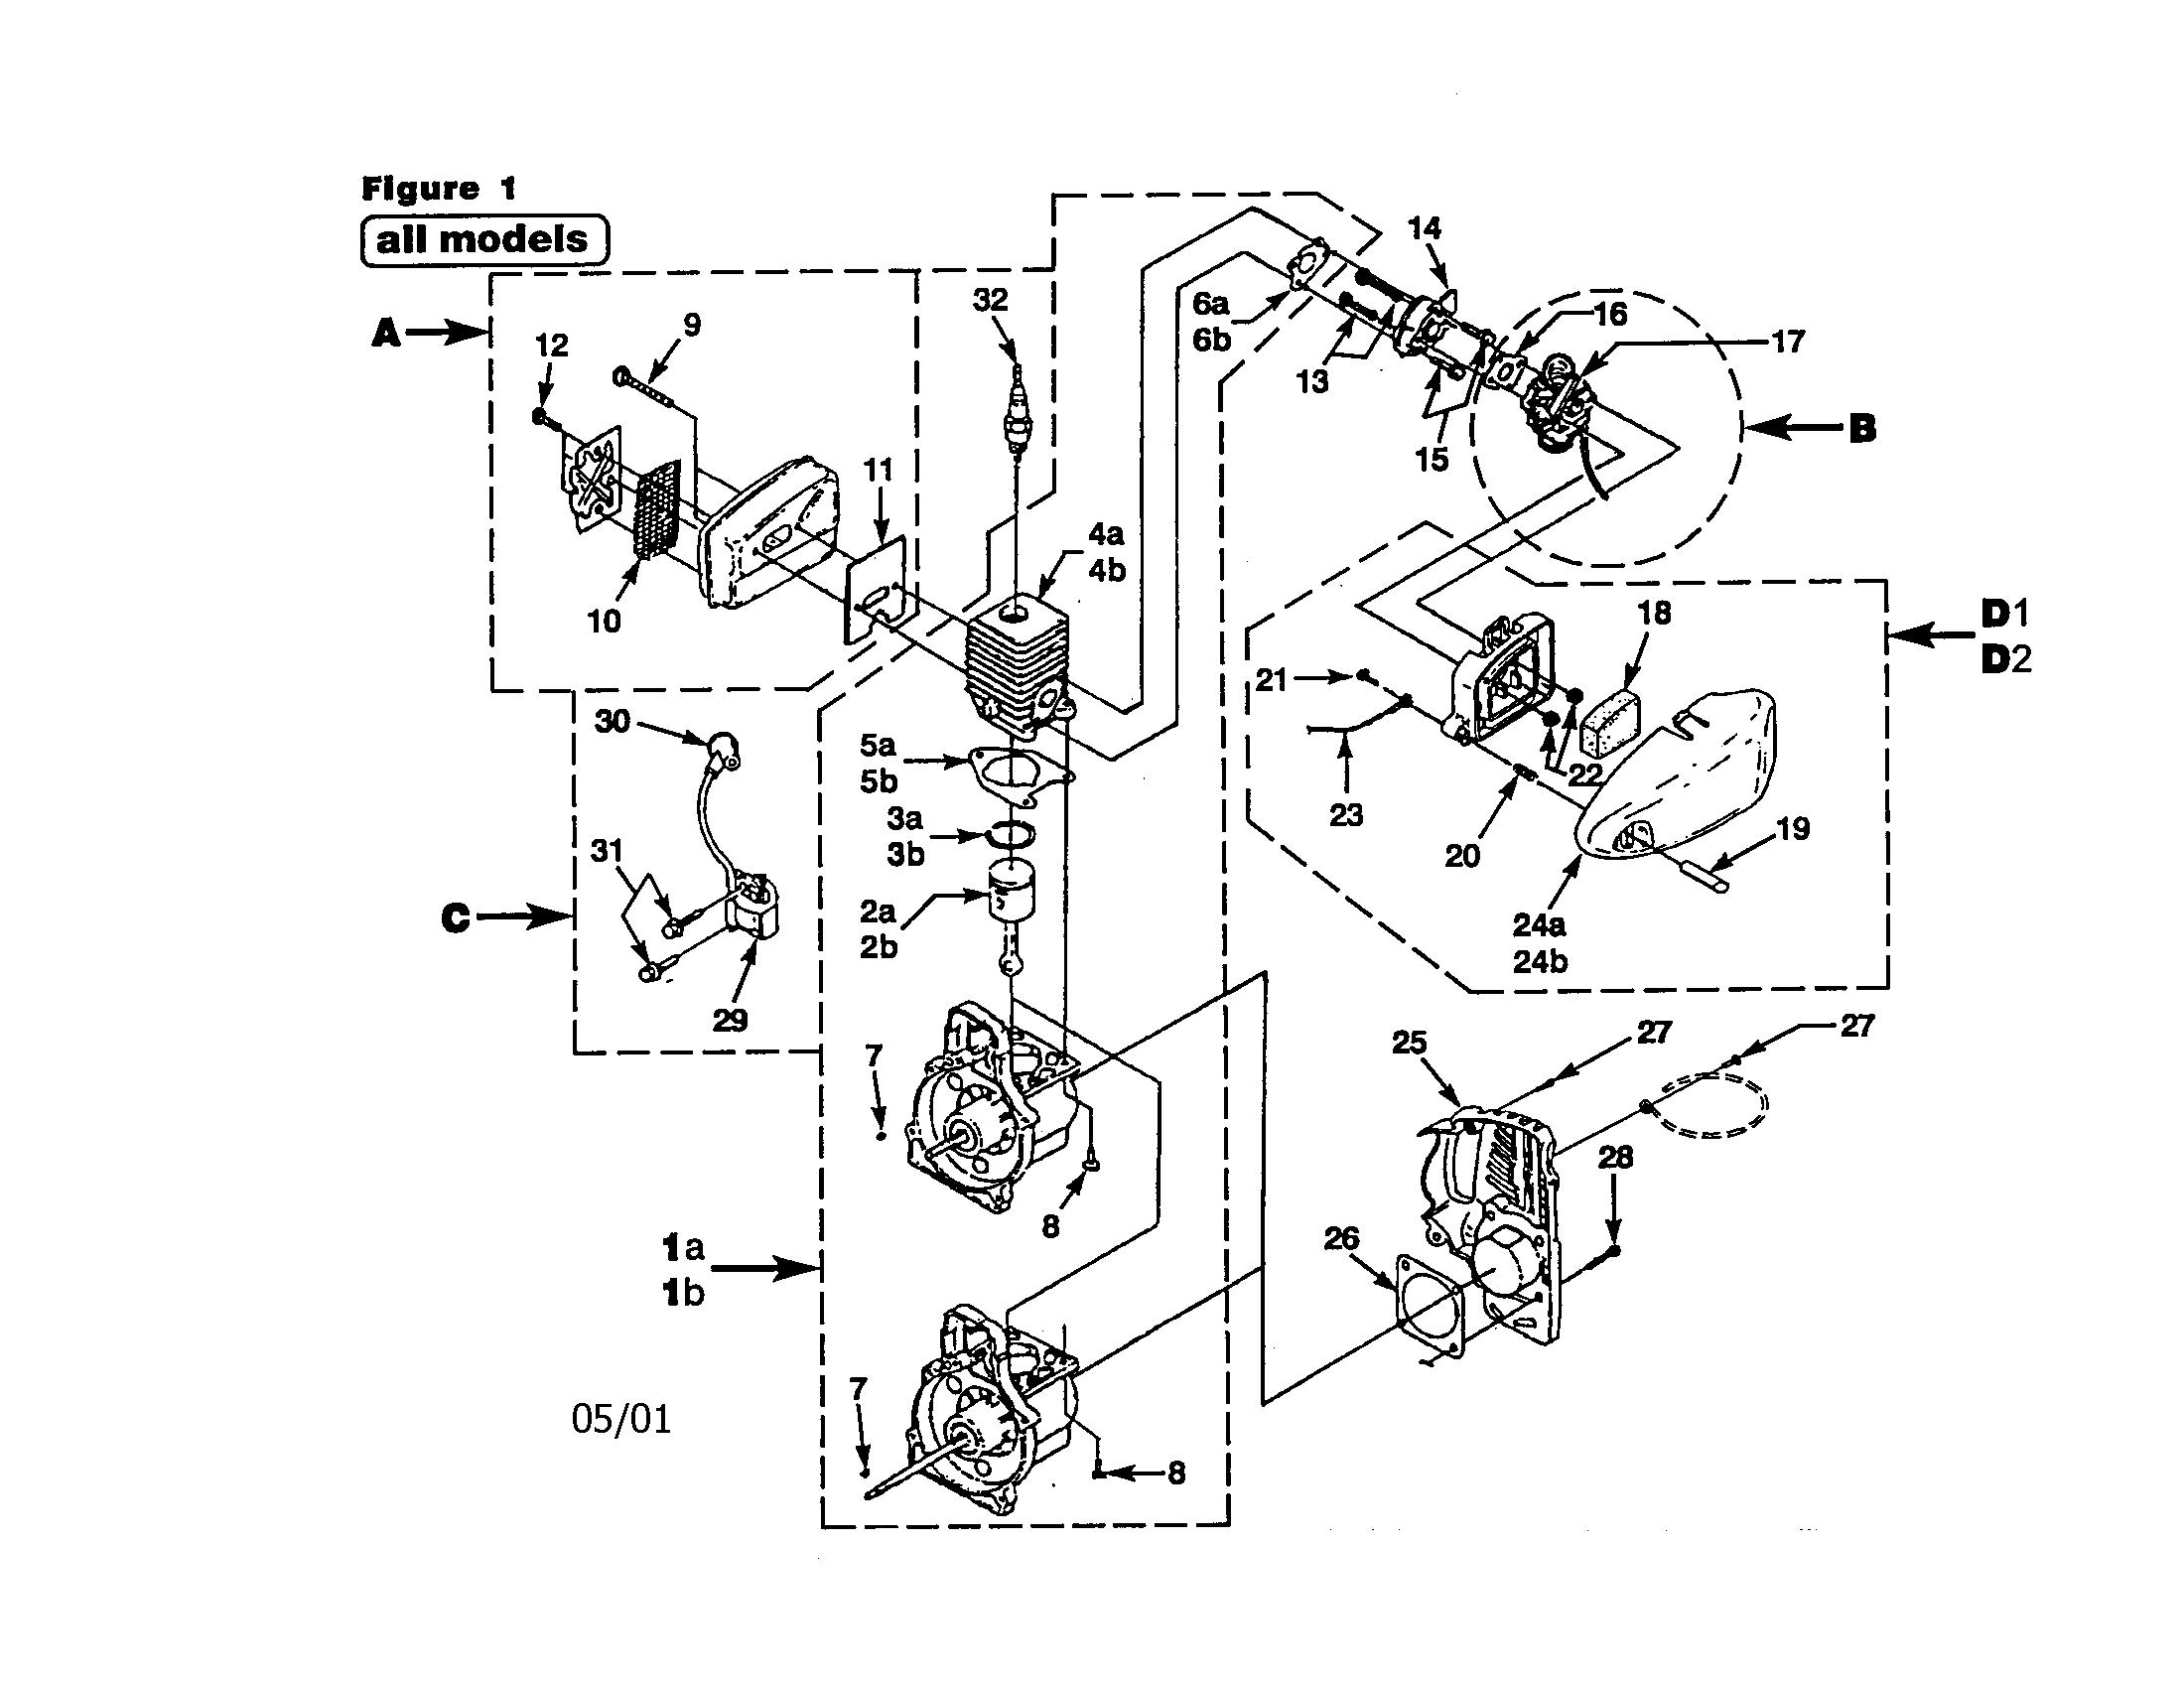 Homelite model UT20631 line trimmers/weedwackers, gas